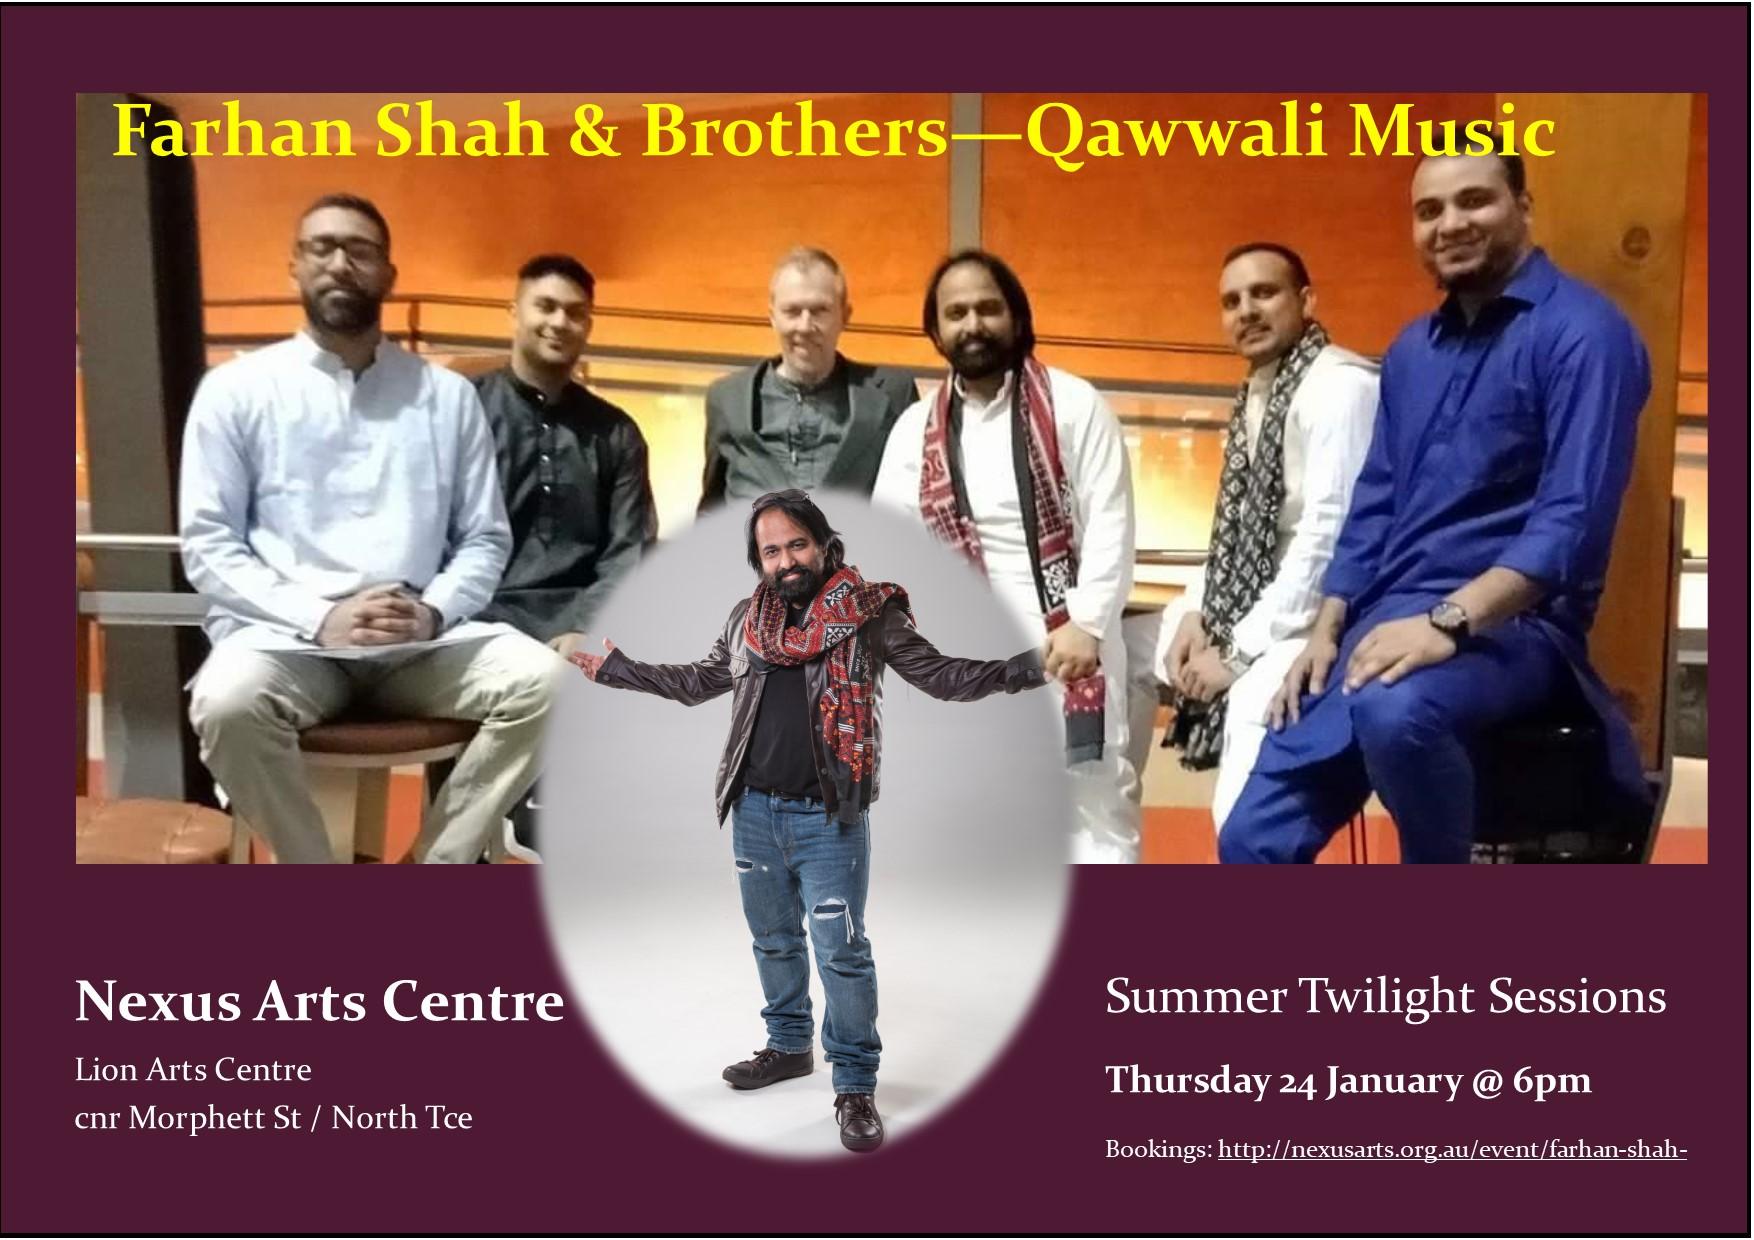 Farhan Shah & Brothers Qawalli